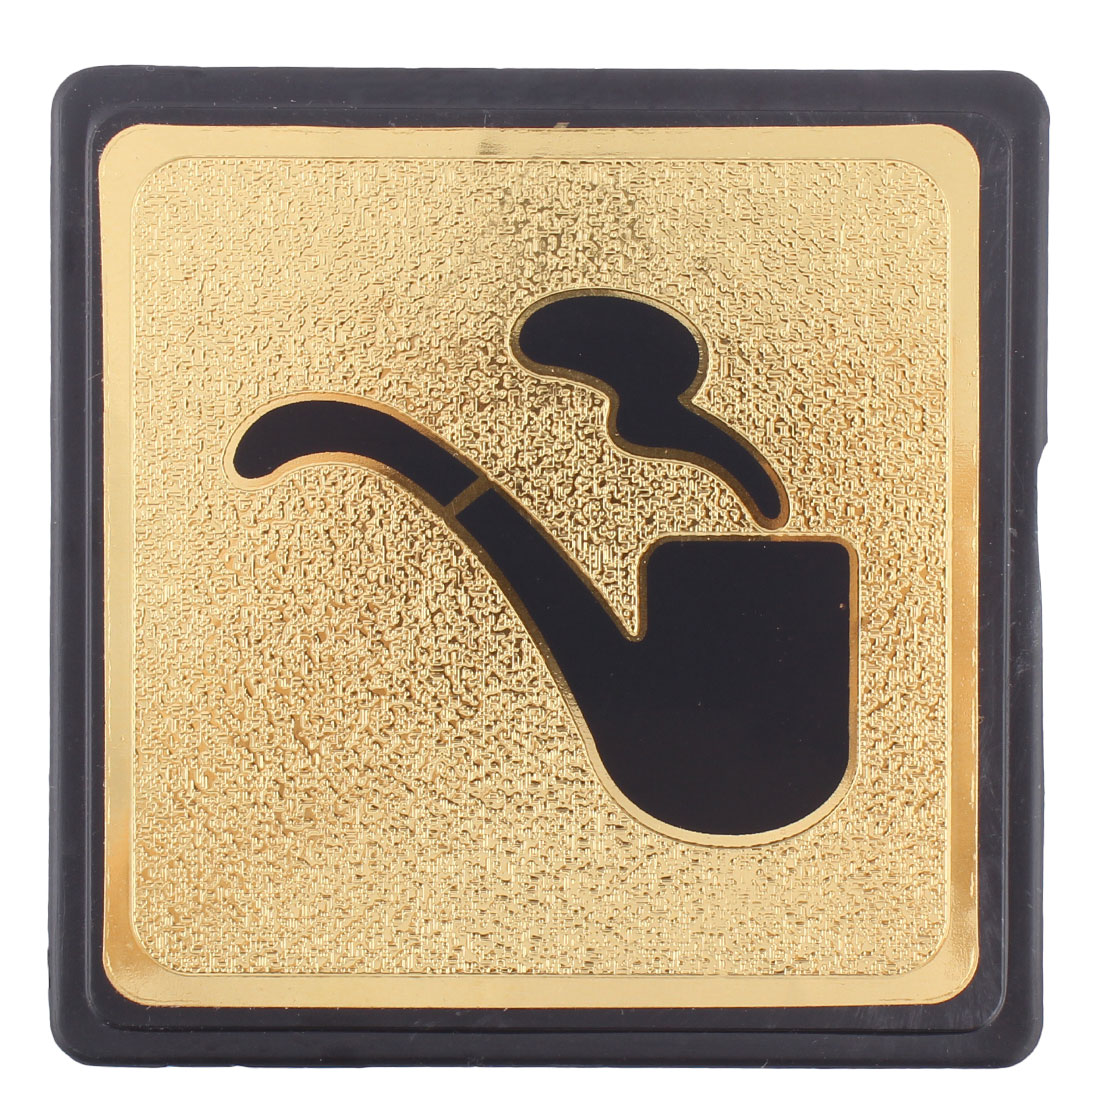 Black Gold Tone Plastic Smoking Sign Board w Adhesive Tape